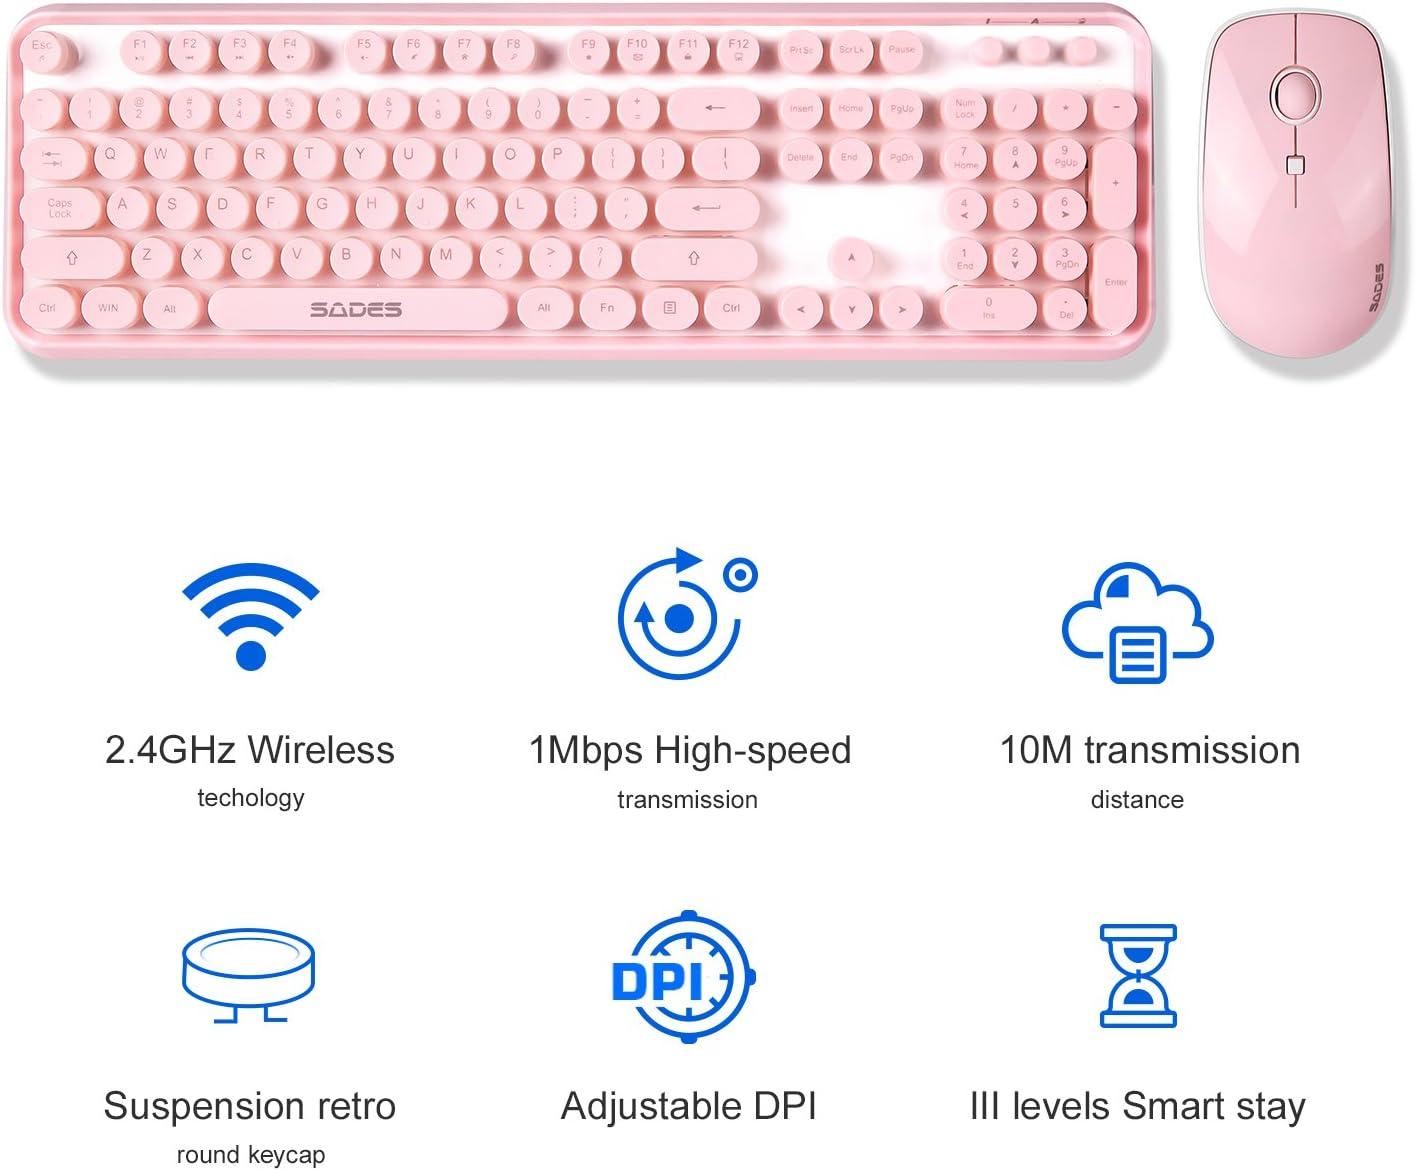 SADES V2020 - Juego de teclado y ratón inalámbricos, teclado rosa con teclas redondas, conexión sin caídas de 2,4 GHz, batería de larga duración para ...